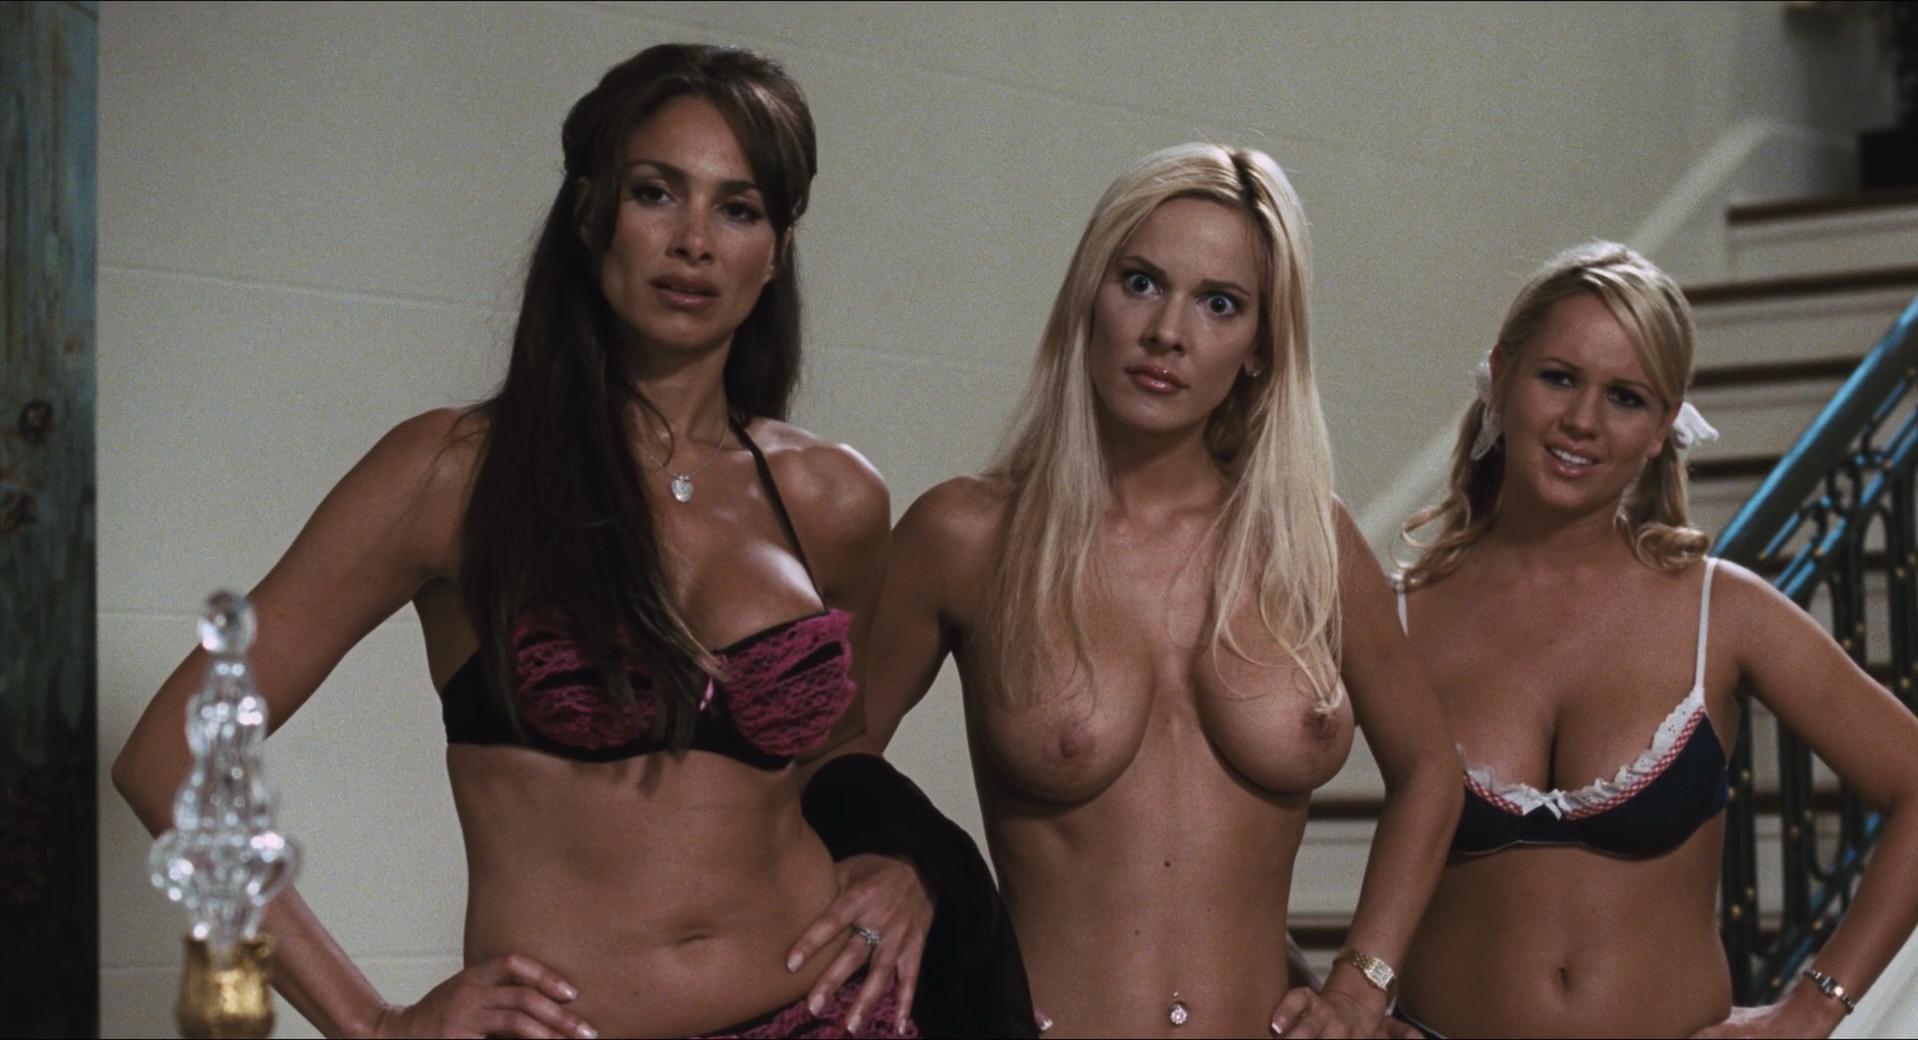 Simona Fusco nude, Jennifer Walcott nude - The Pool Boys (2011)